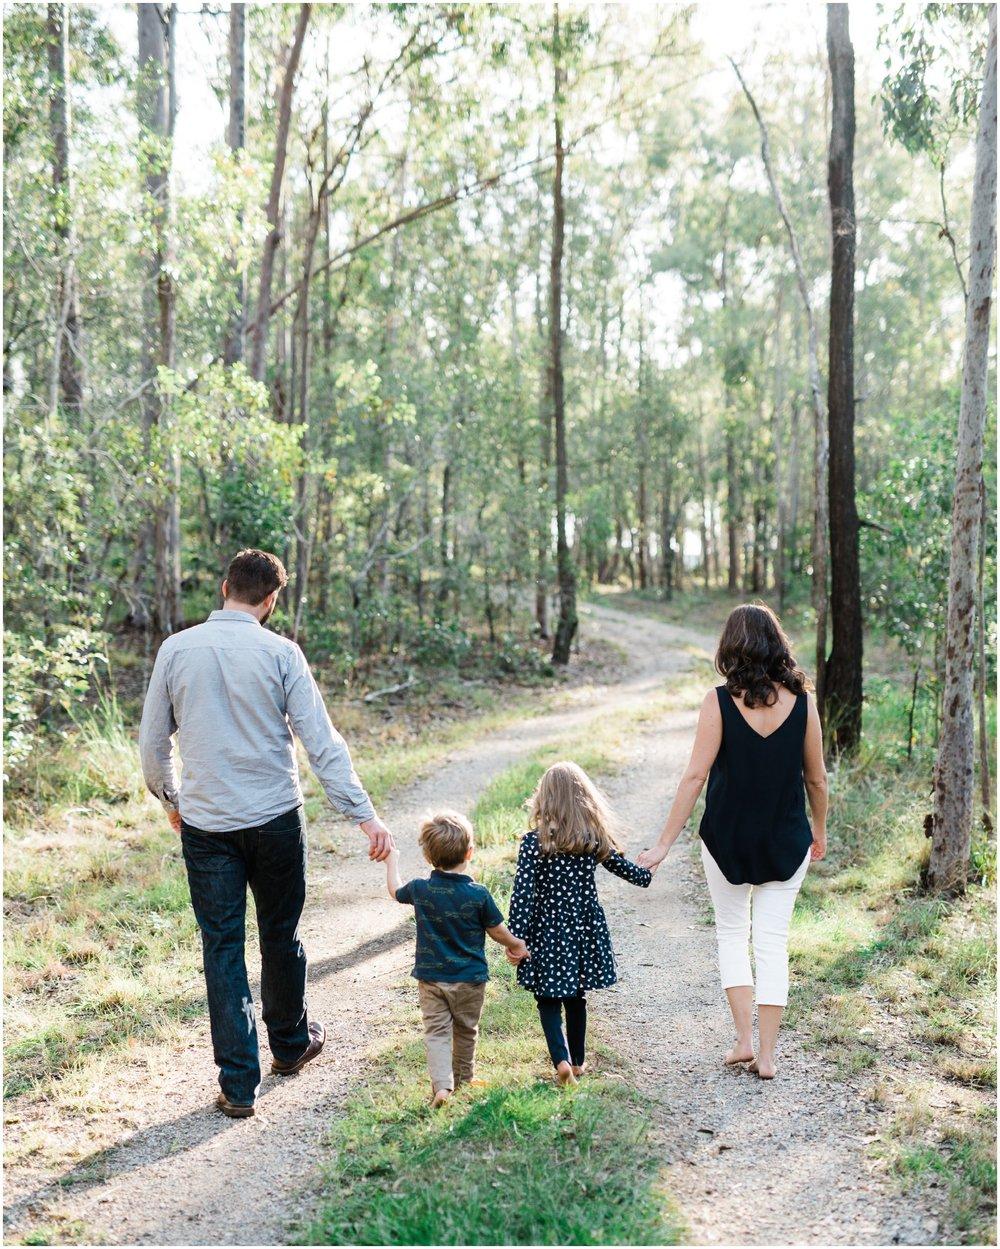 Brisbane-Family-Lifestlye-Photography-Home3.jpg